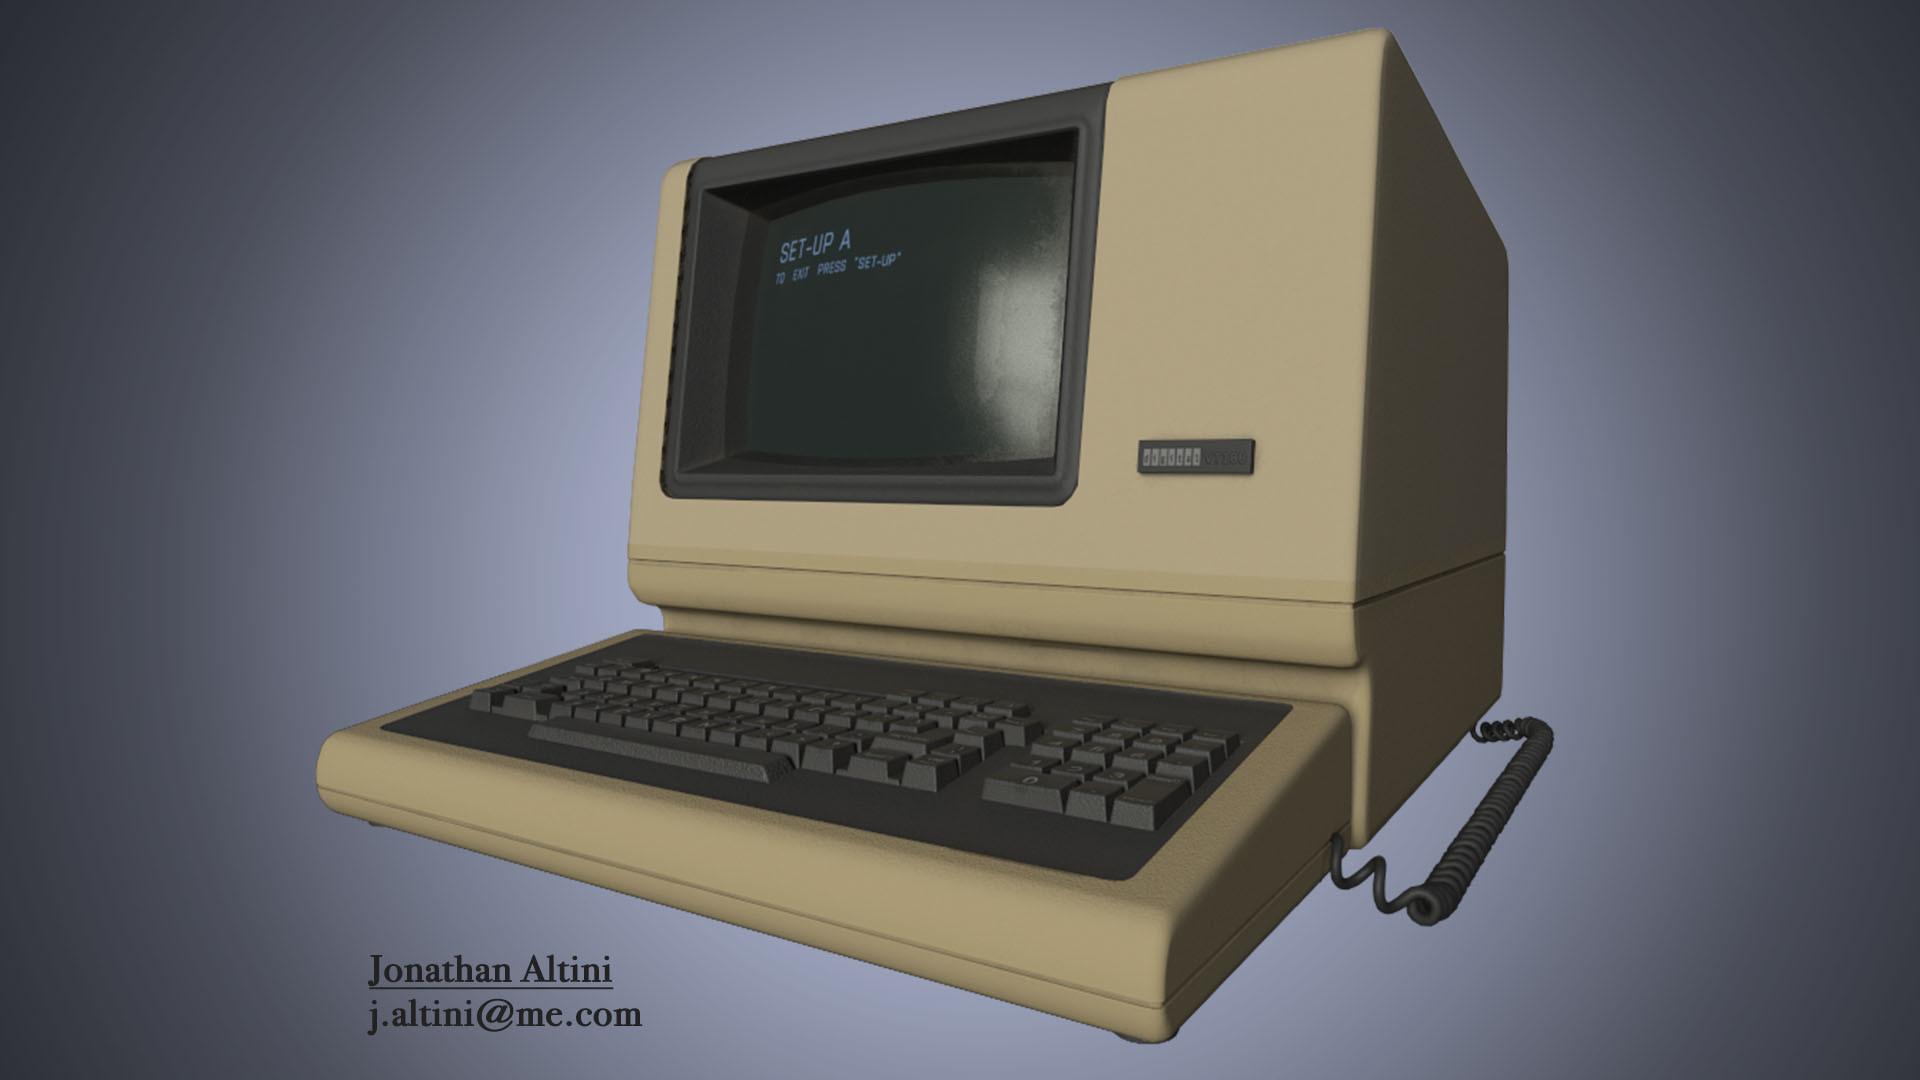 Jonathan Altini - DEC VT100 terminal